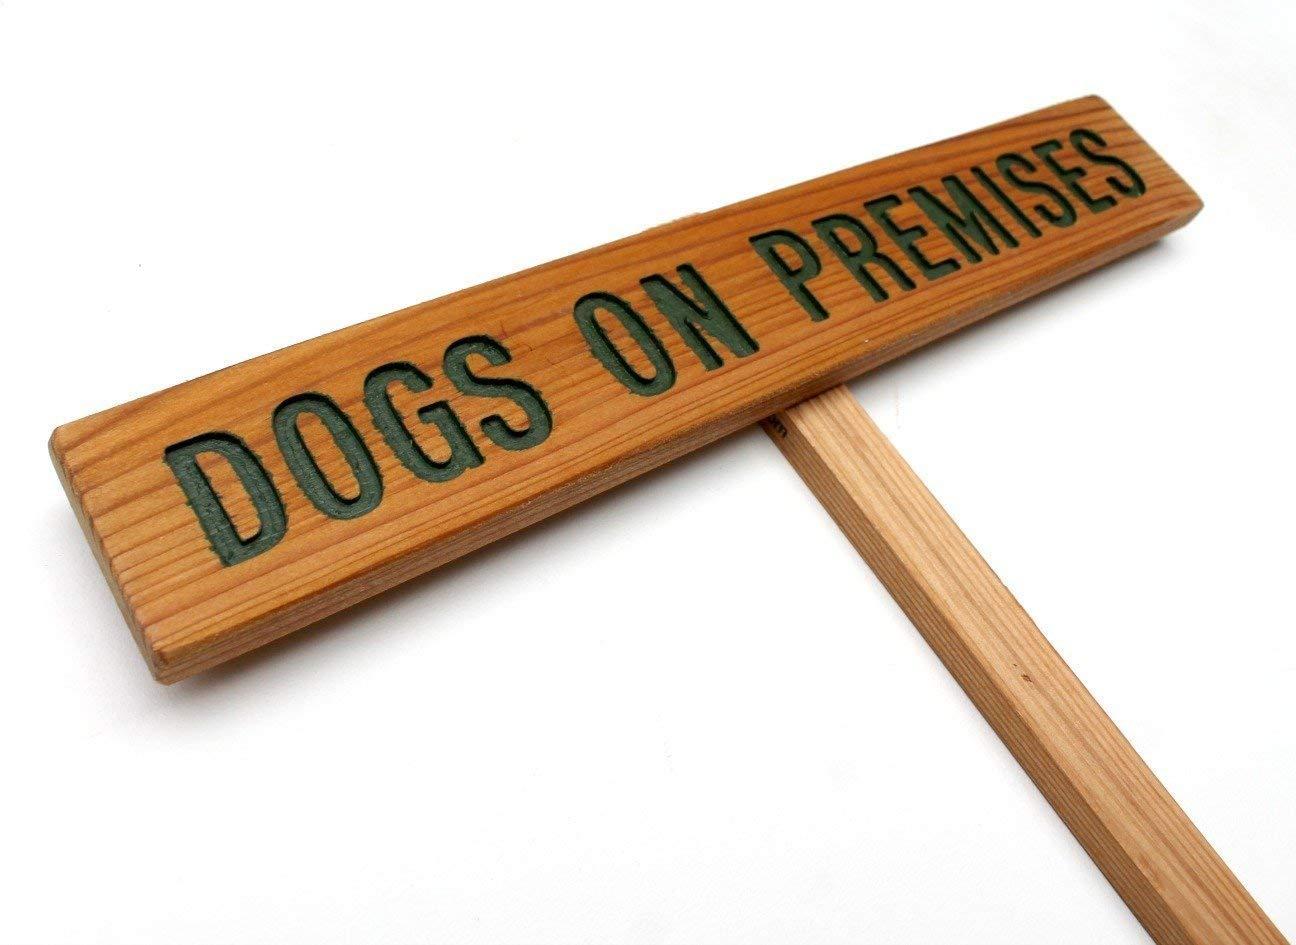 DOGS ON PREMISES Sign, Guard Dog Marker, Warning Sign, Driveway Marker, Outdoor Sign, Garden Marker, Dog Warning Sign, Dog Marker, Wood Sign, Yard Art